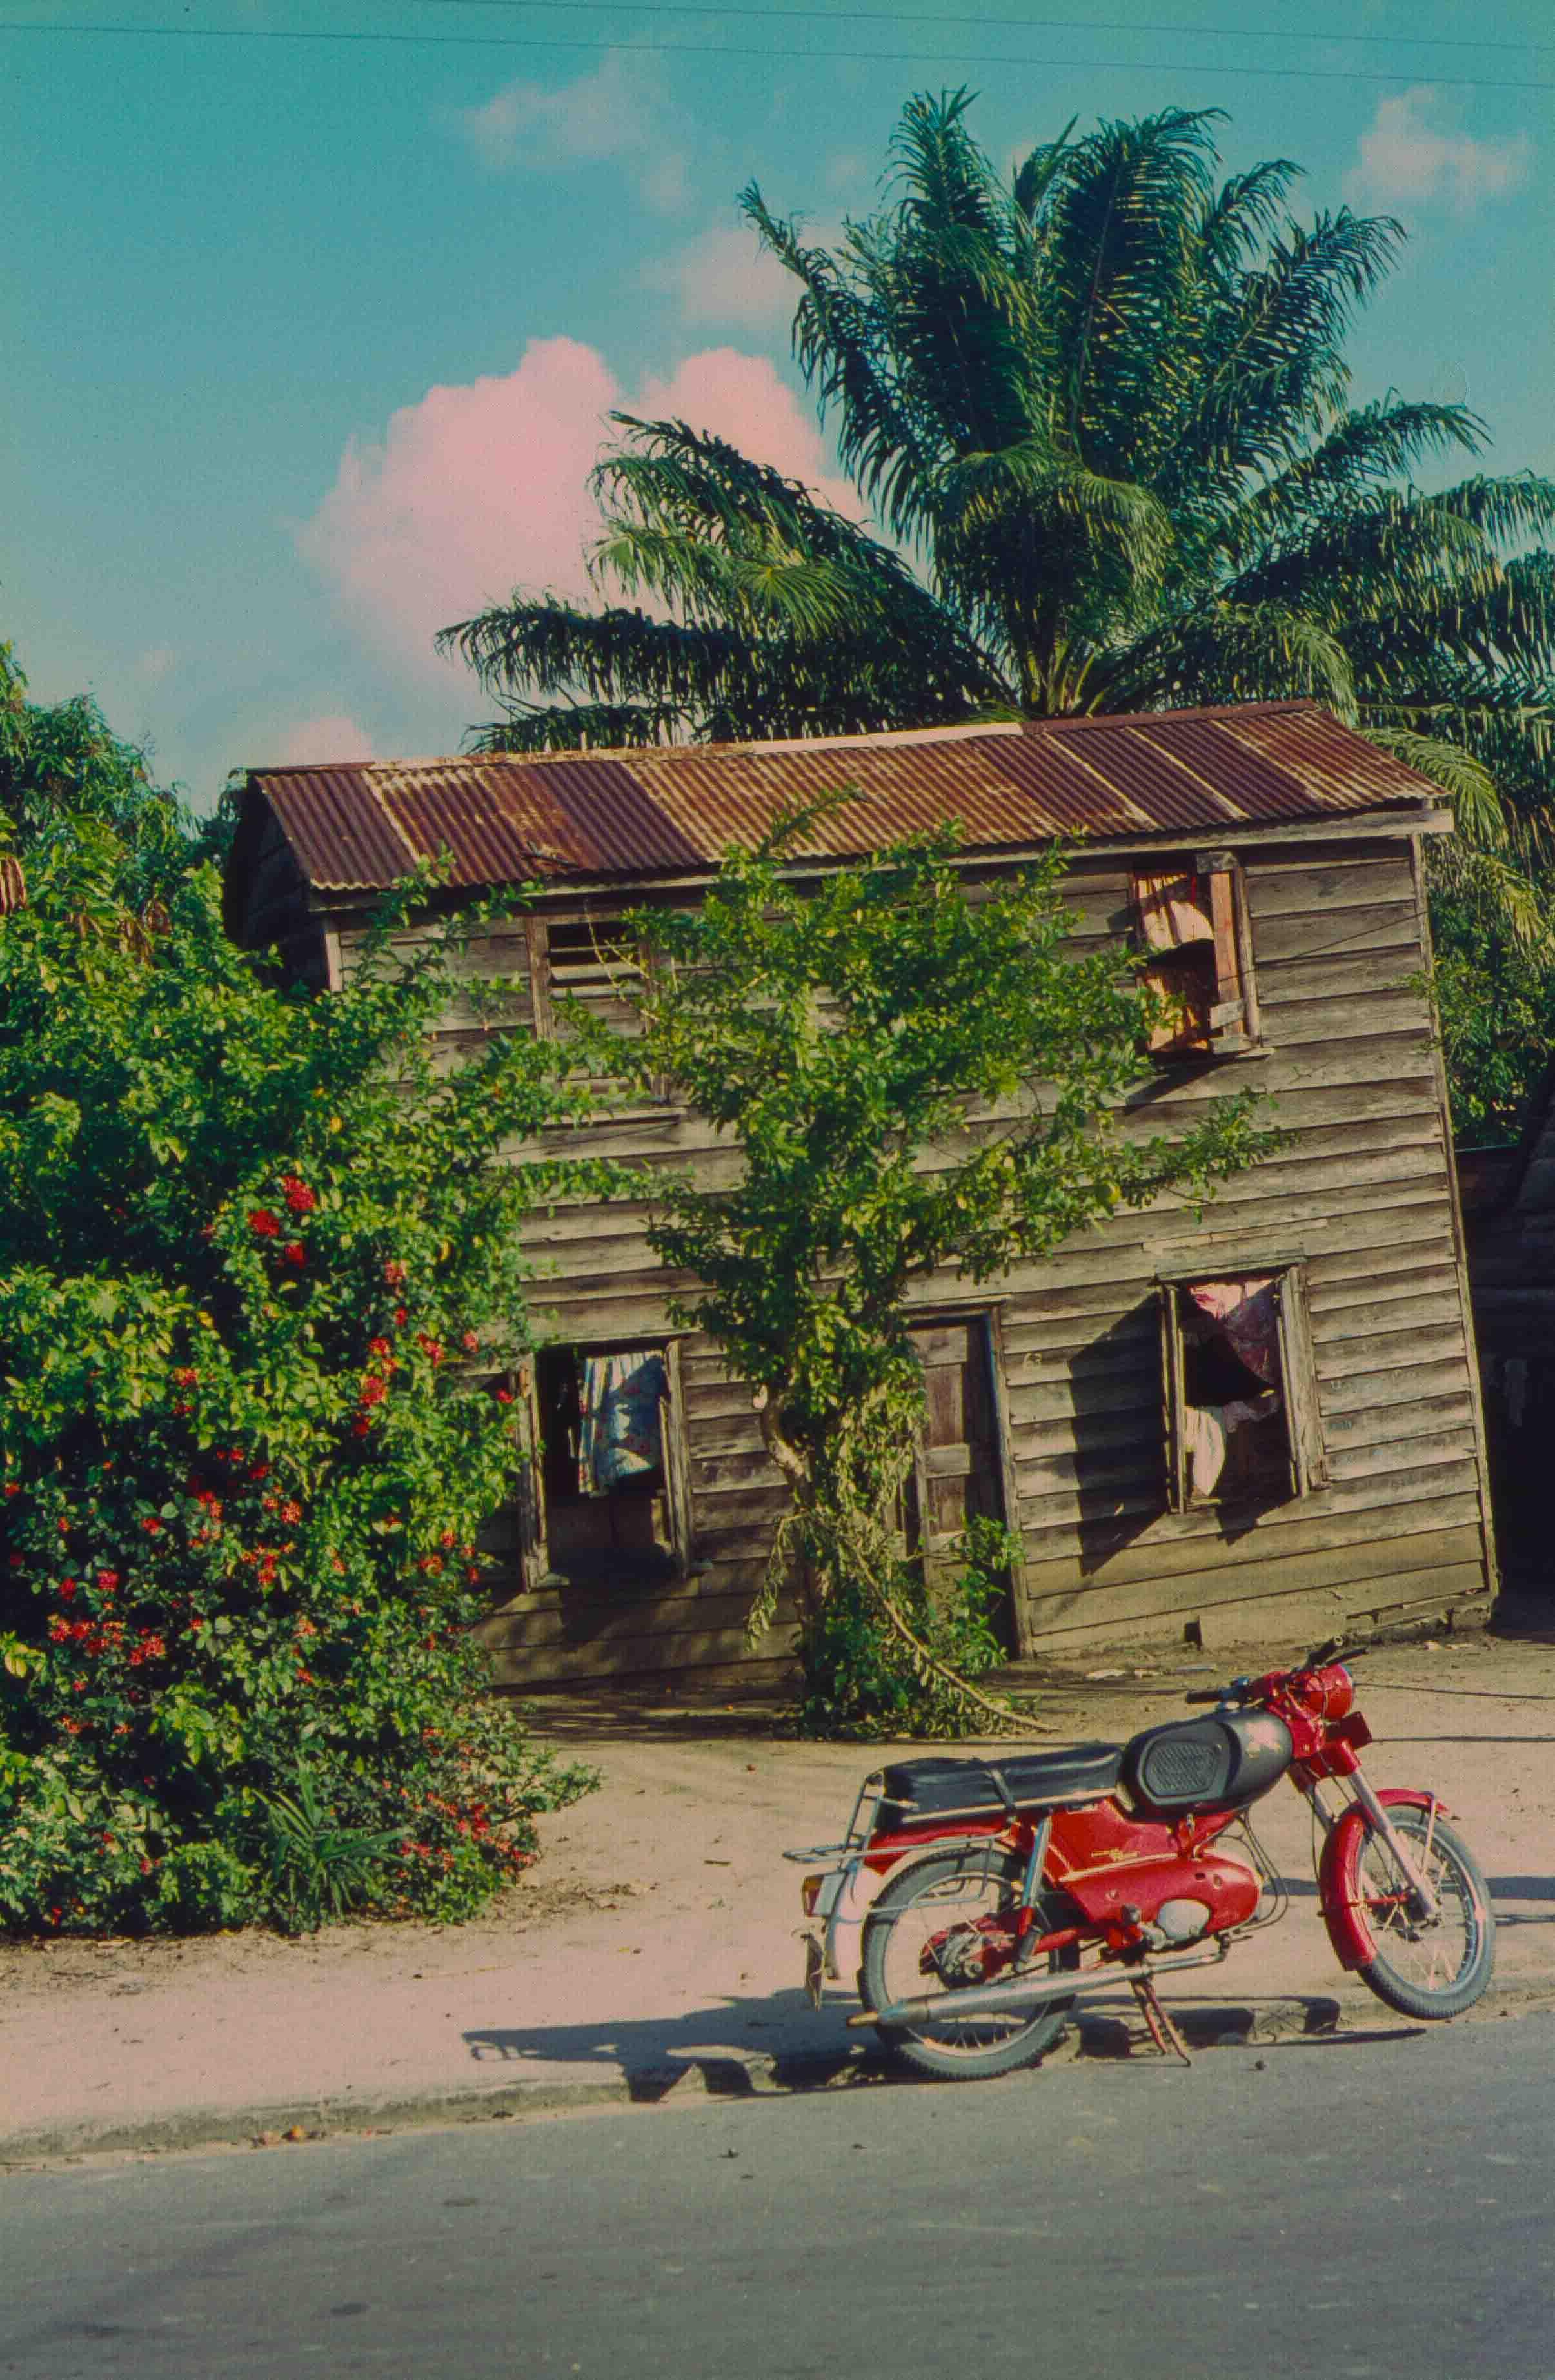 215. Suriname